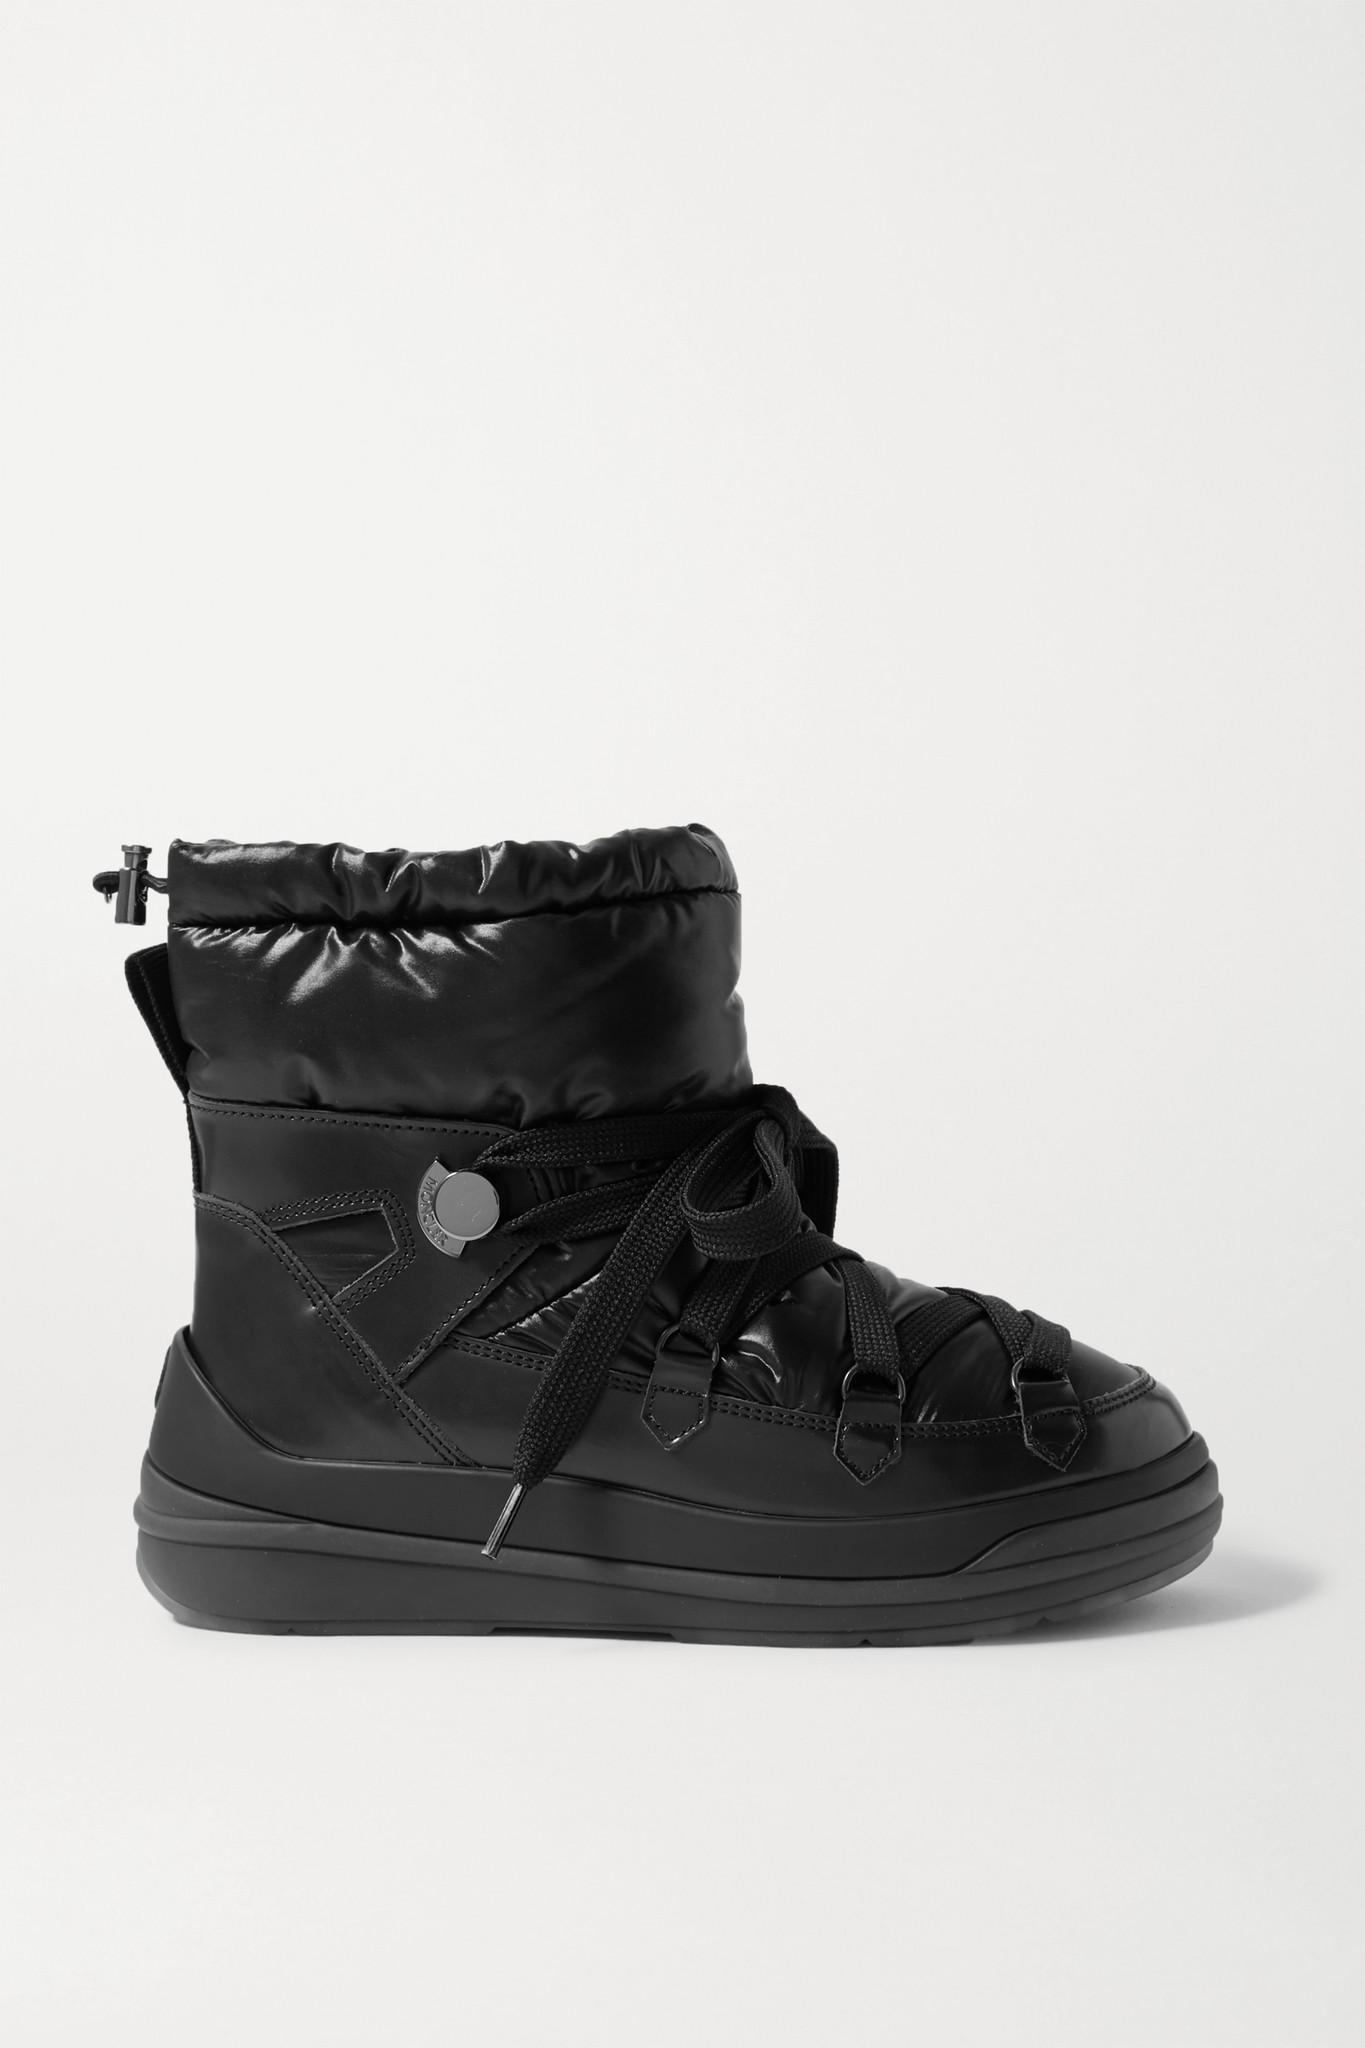 MONCLER - Insolux 皮革带填充物软壳面料踝靴 - 黑色 - IT37